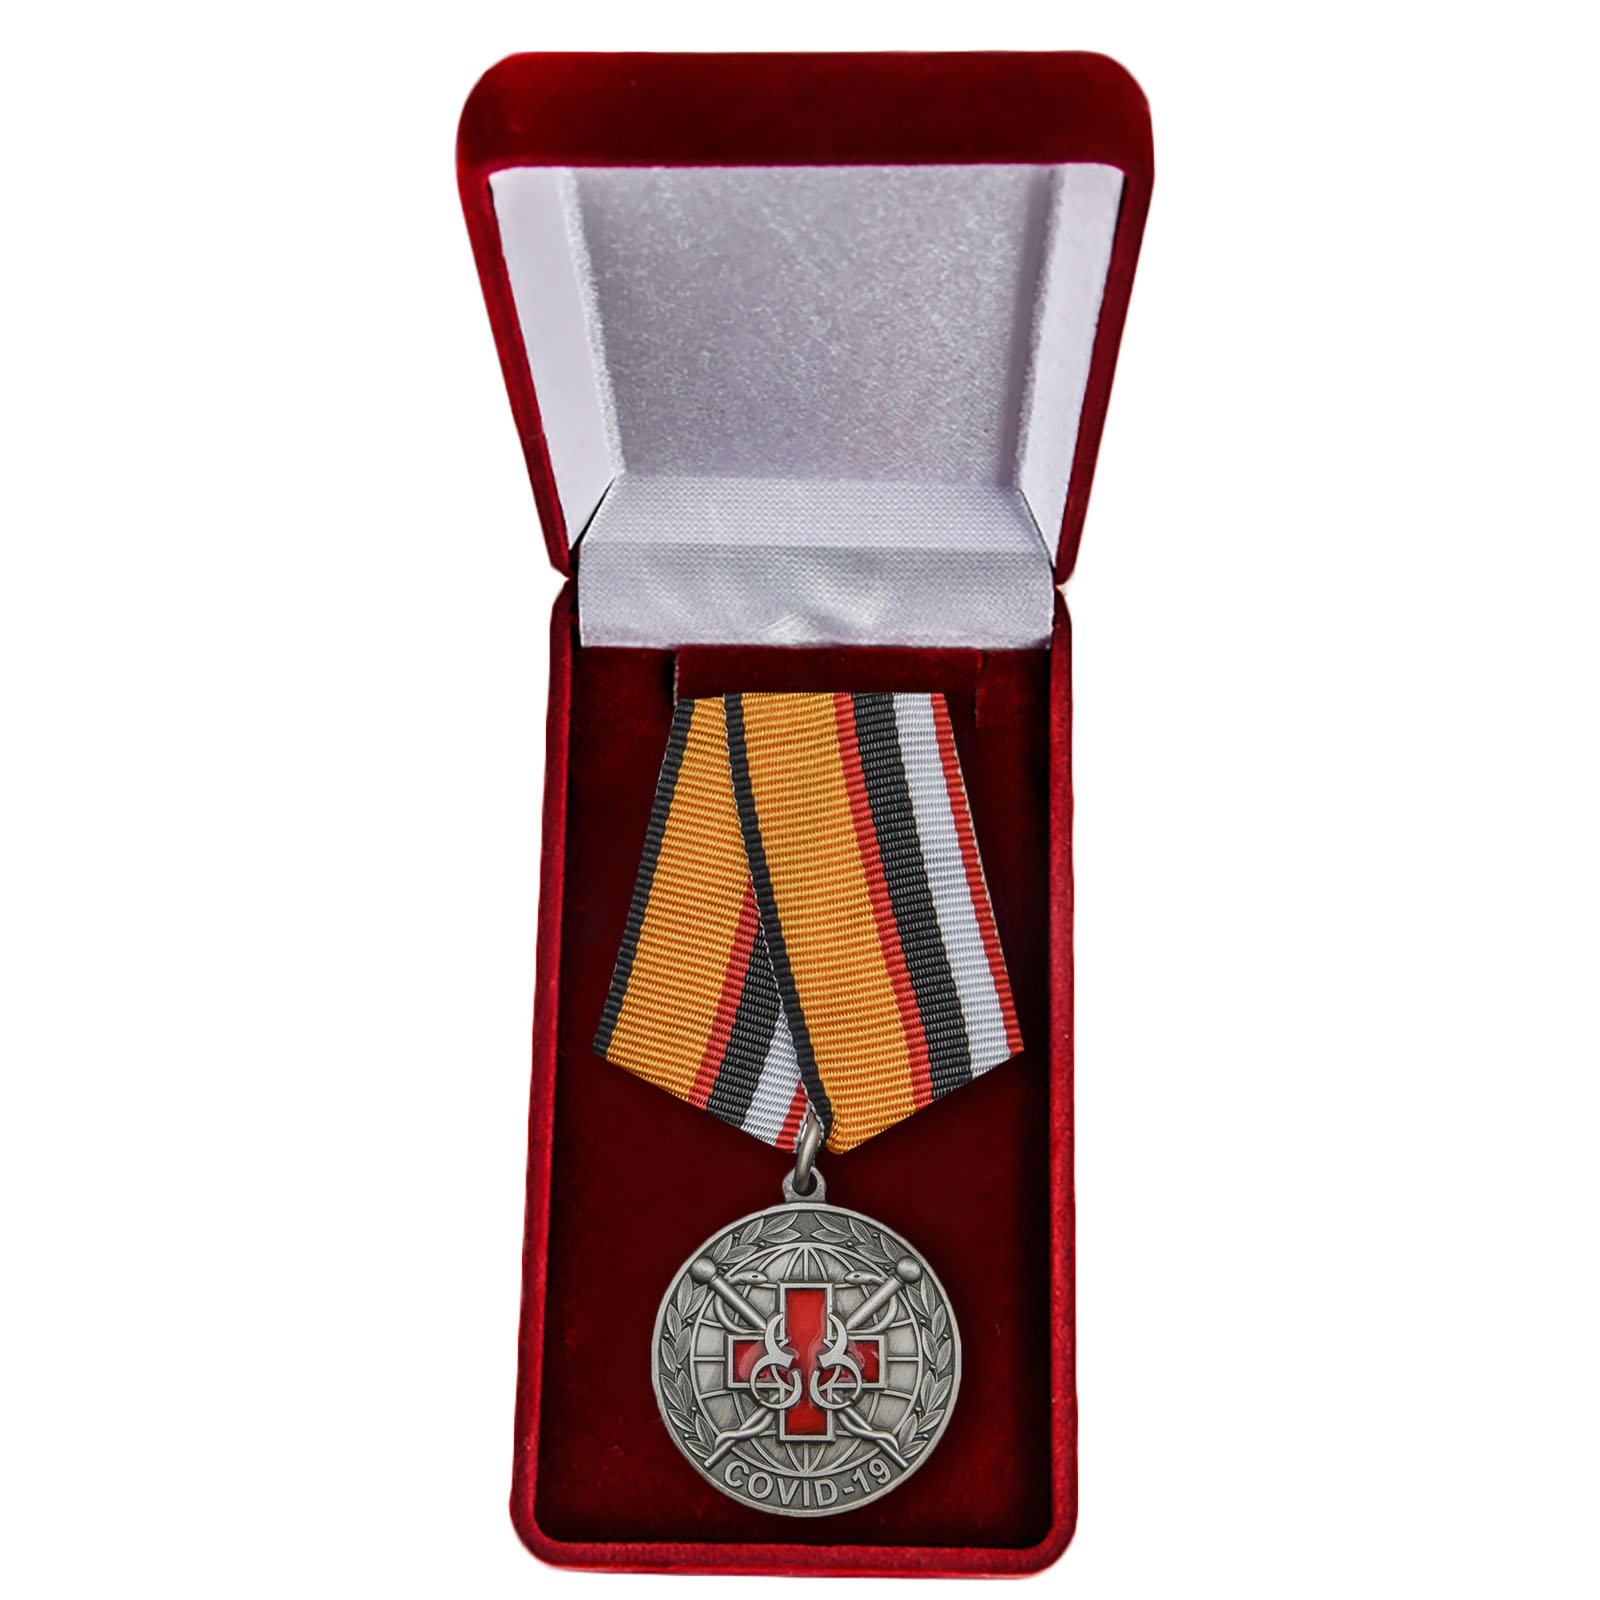 Памятная медаль За борьбу с пандемией COVID-19 - в футляре